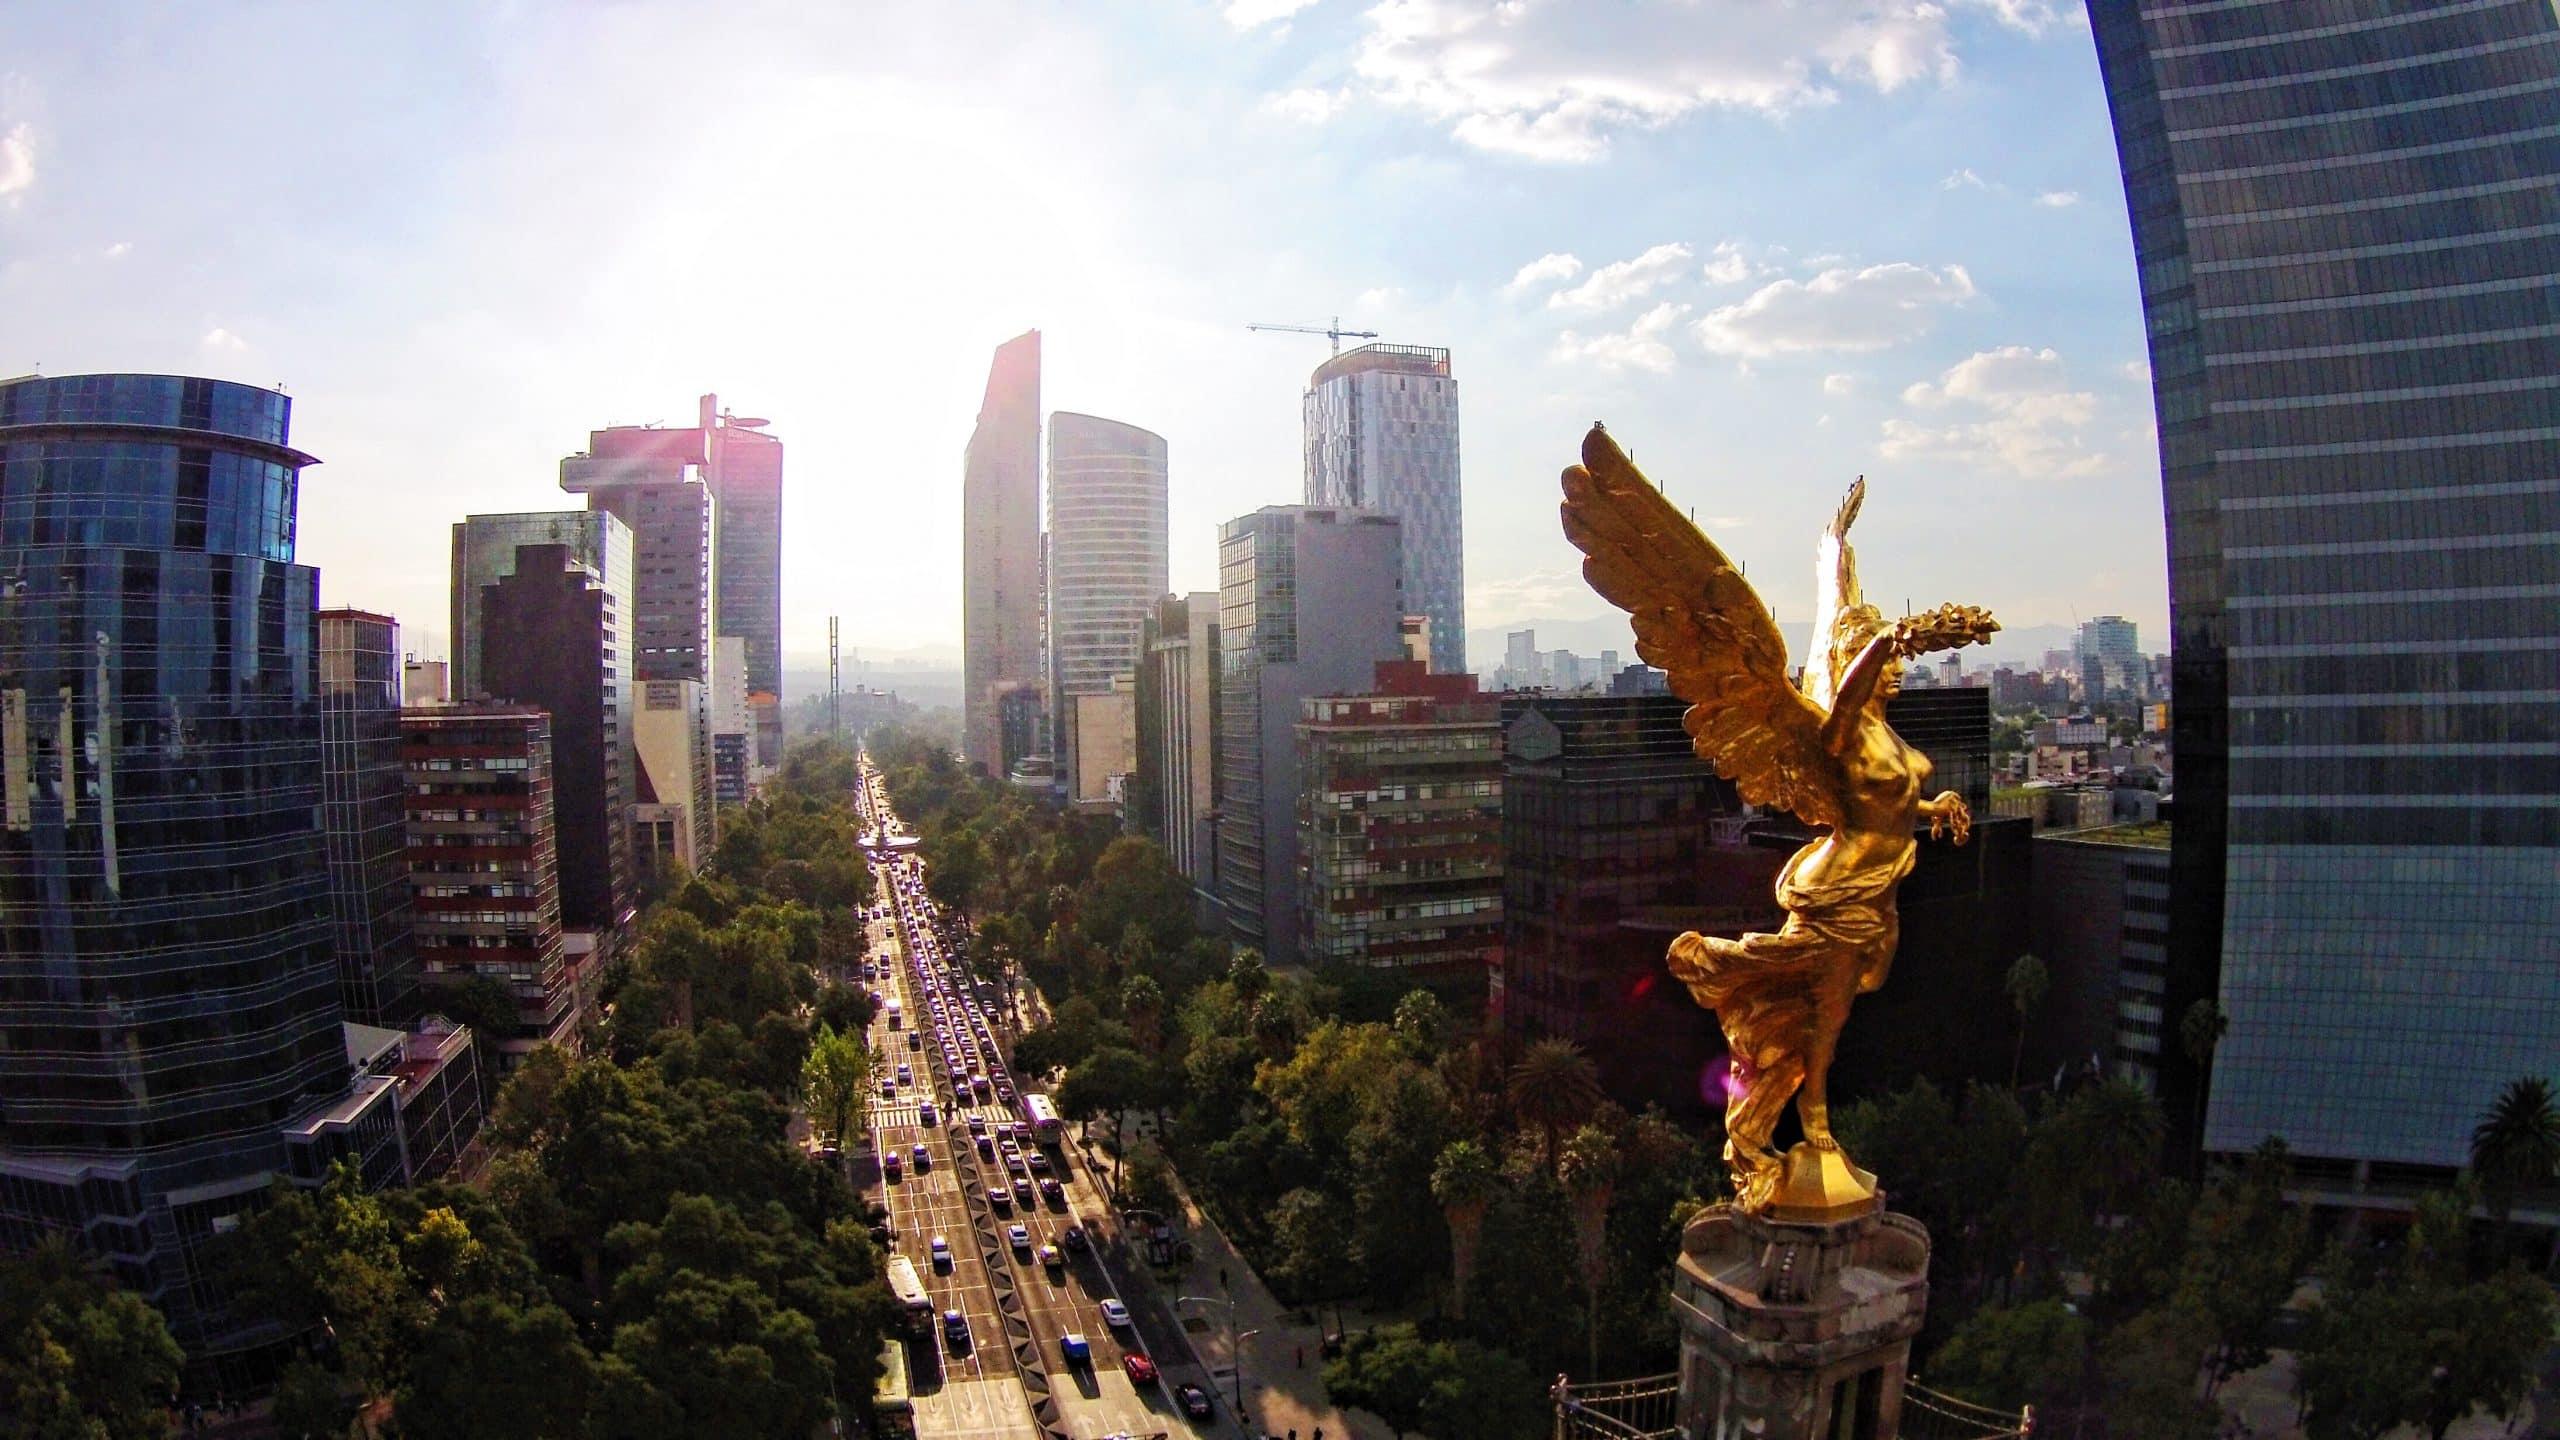 Aerial view of Juarez Neighborhood in Mexico City